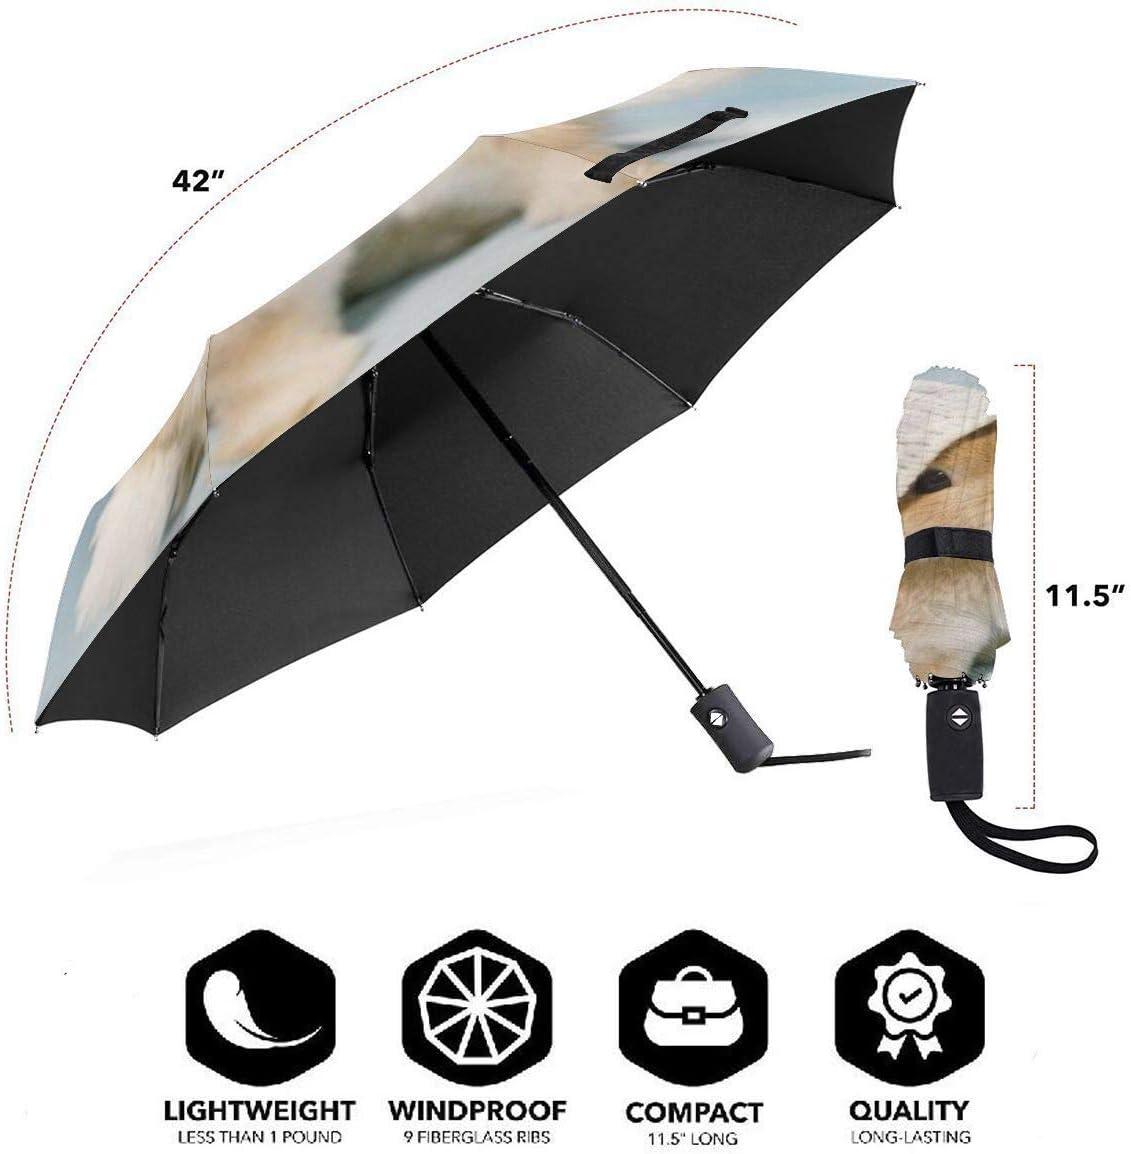 DXDXL Rabbit Automatic Tri-fold Umbrella Inside Print One Size